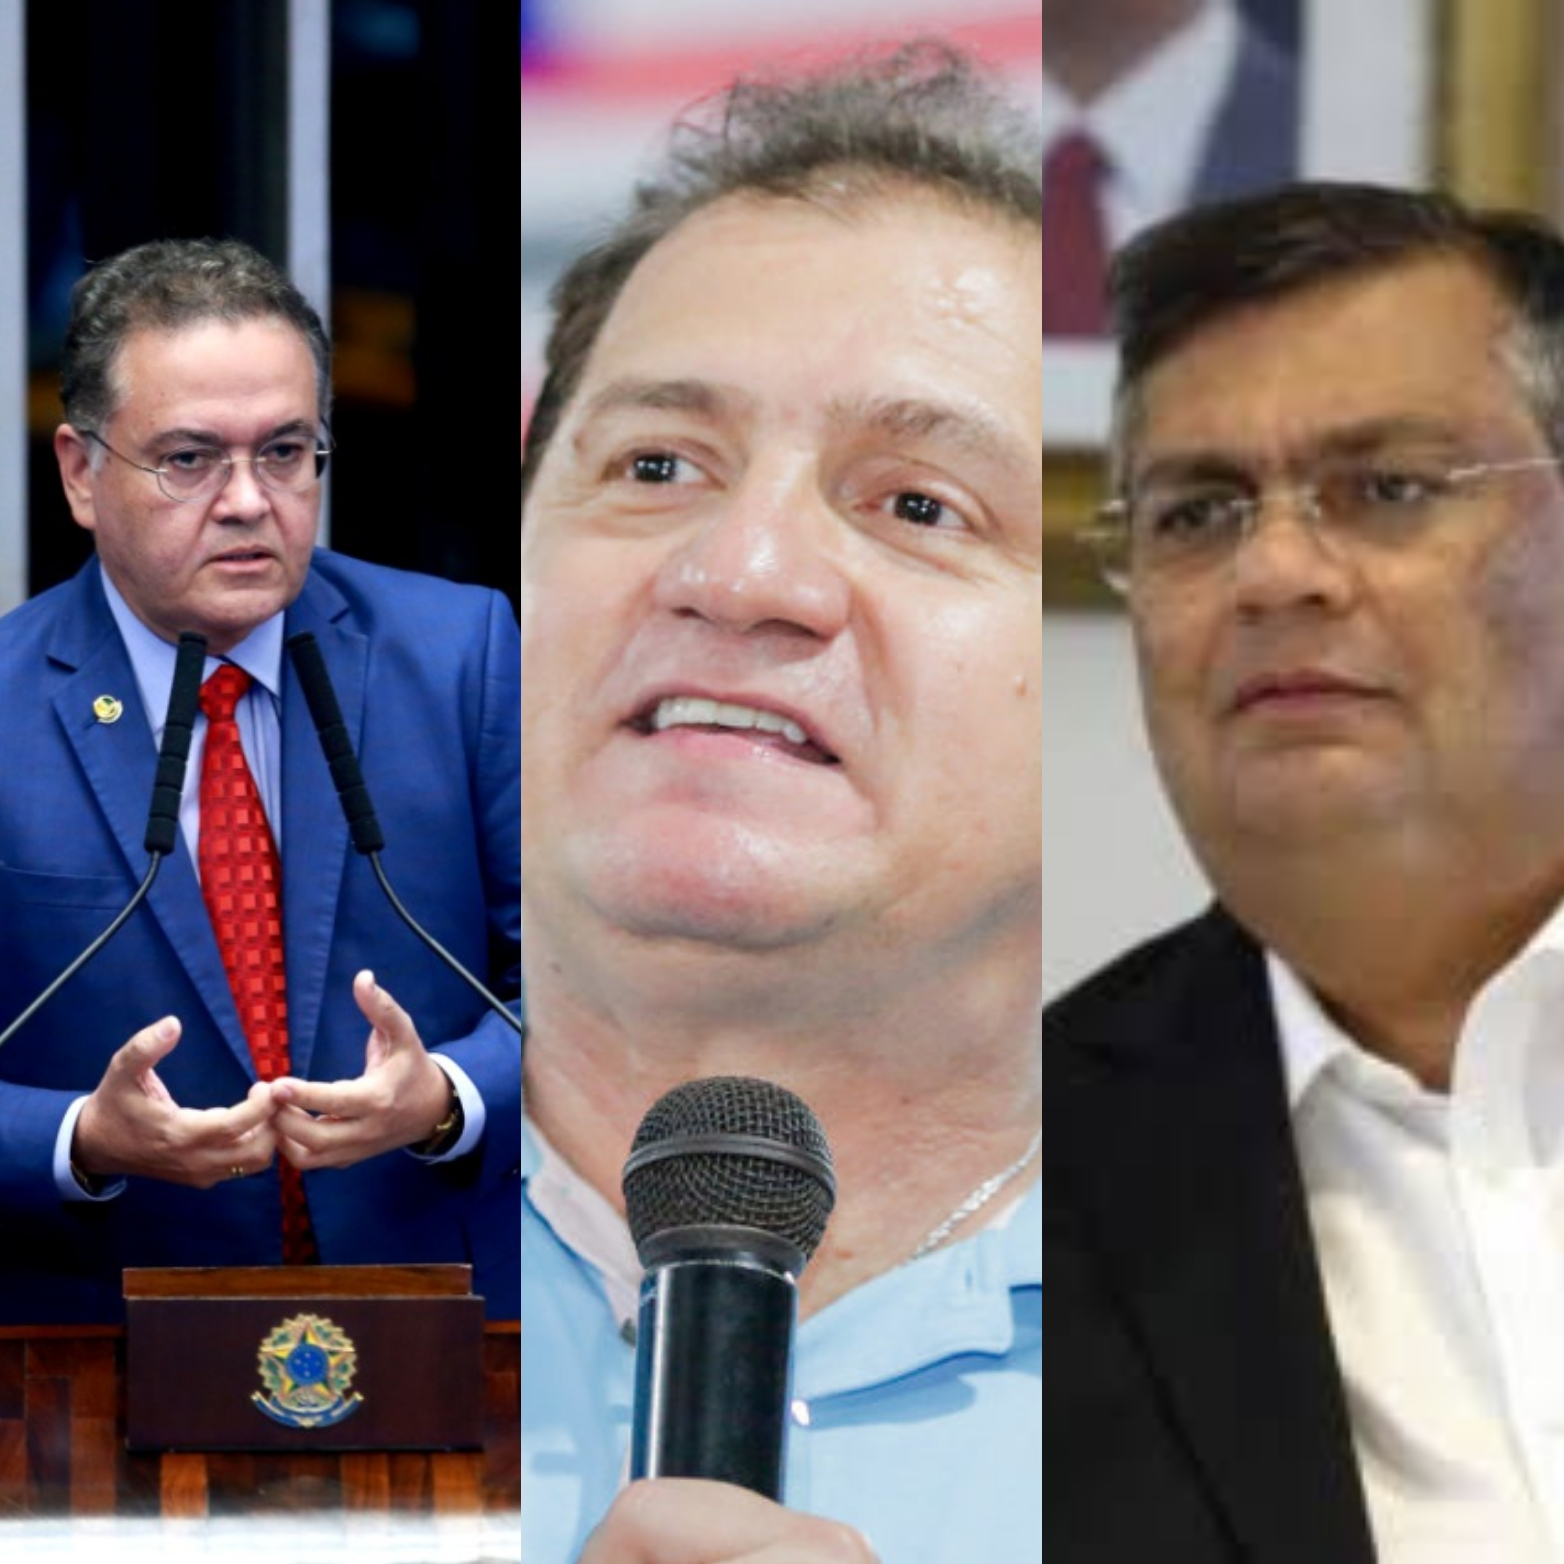 Roberto Rocha ataca Flávio Dino, mas quem levanta a voz é Simplício Araújo